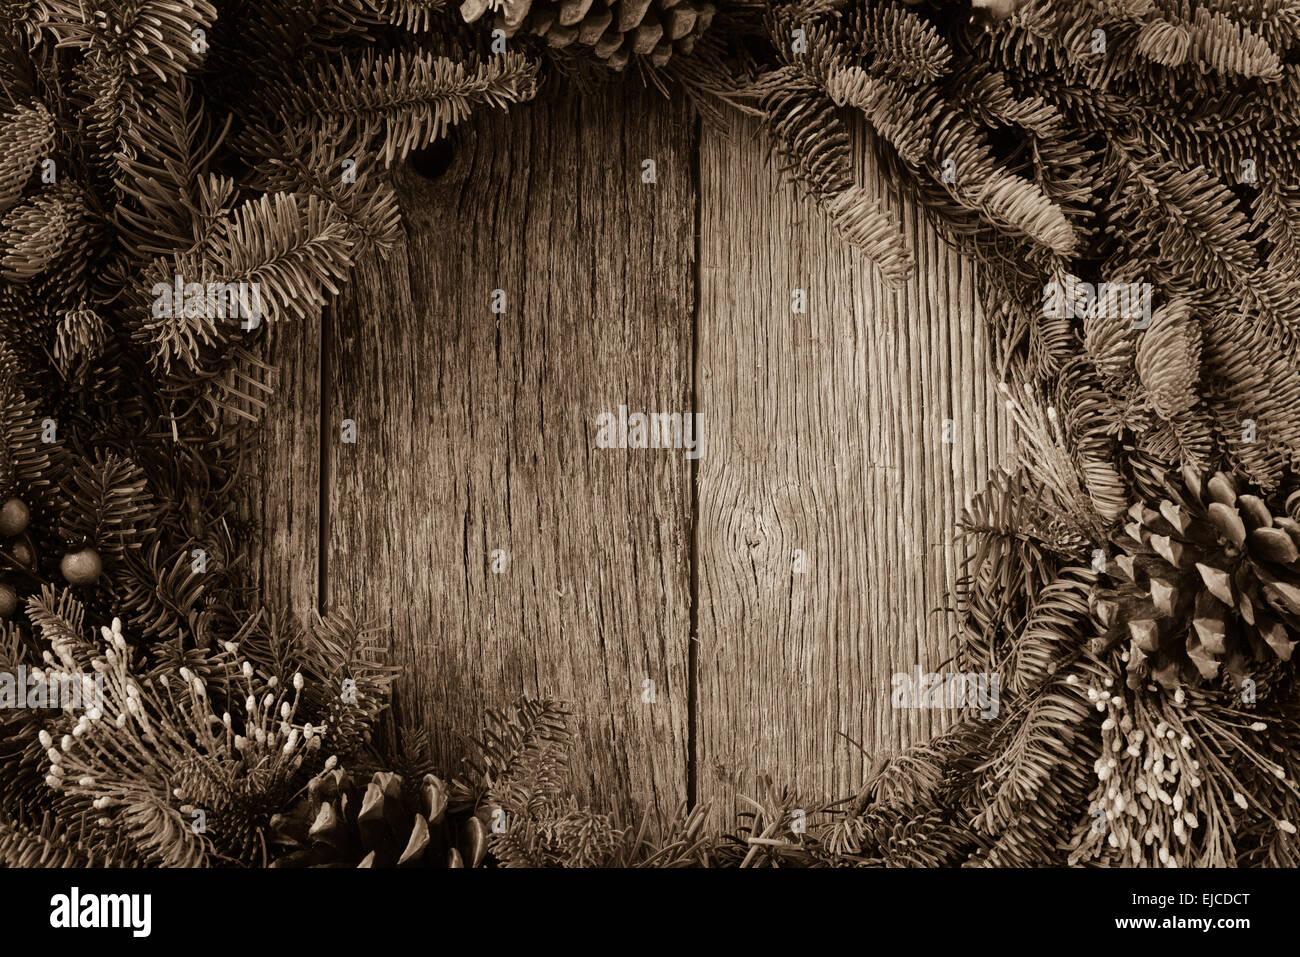 Christmas Wreath On Rustic Wood Background